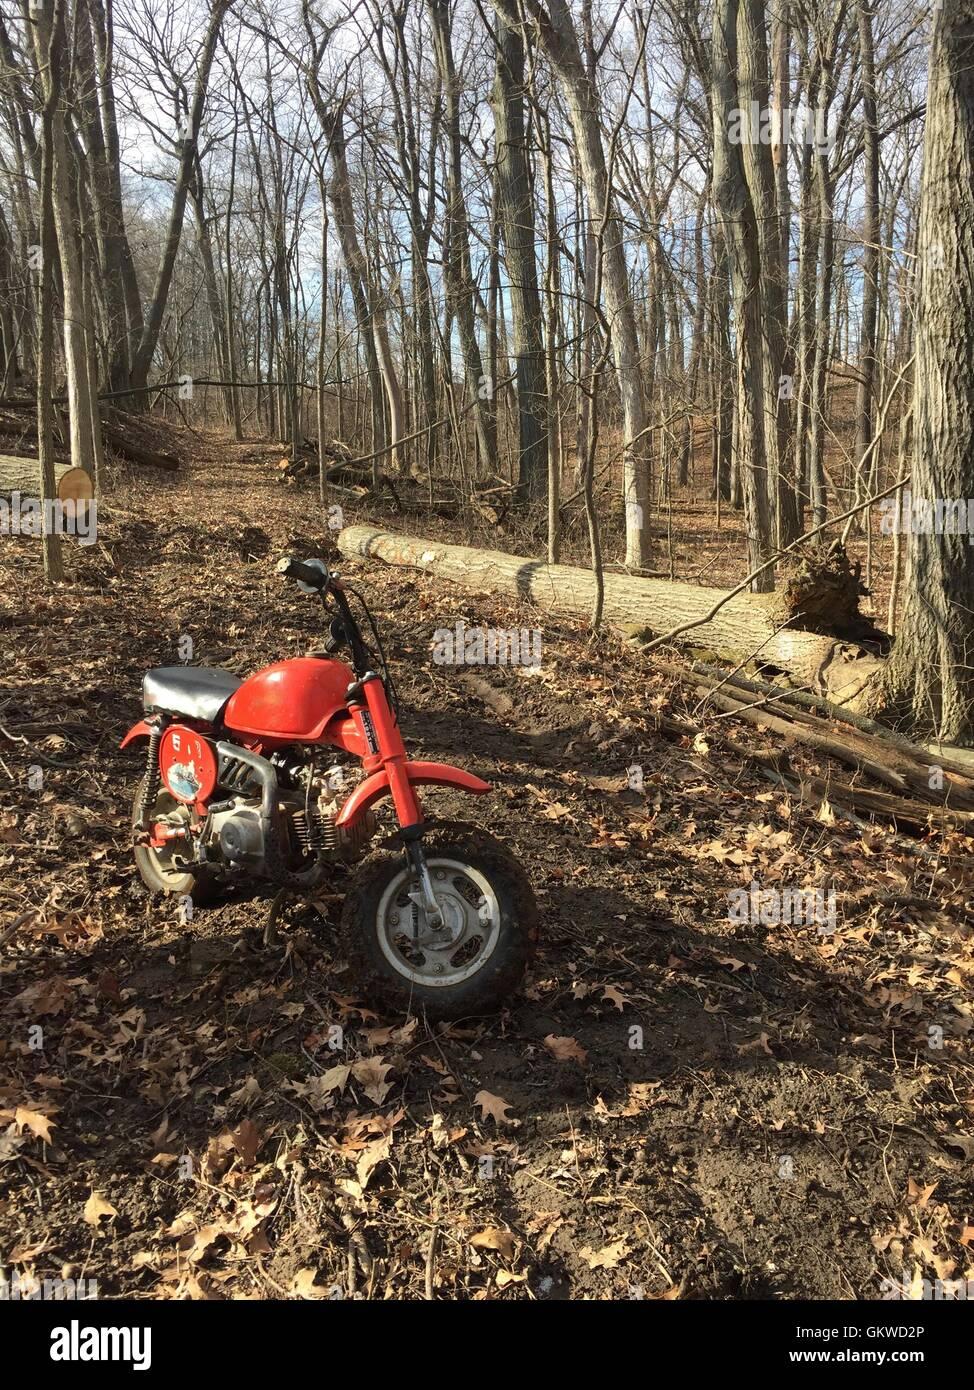 Mini Dirt bike on a trail - Stock Image